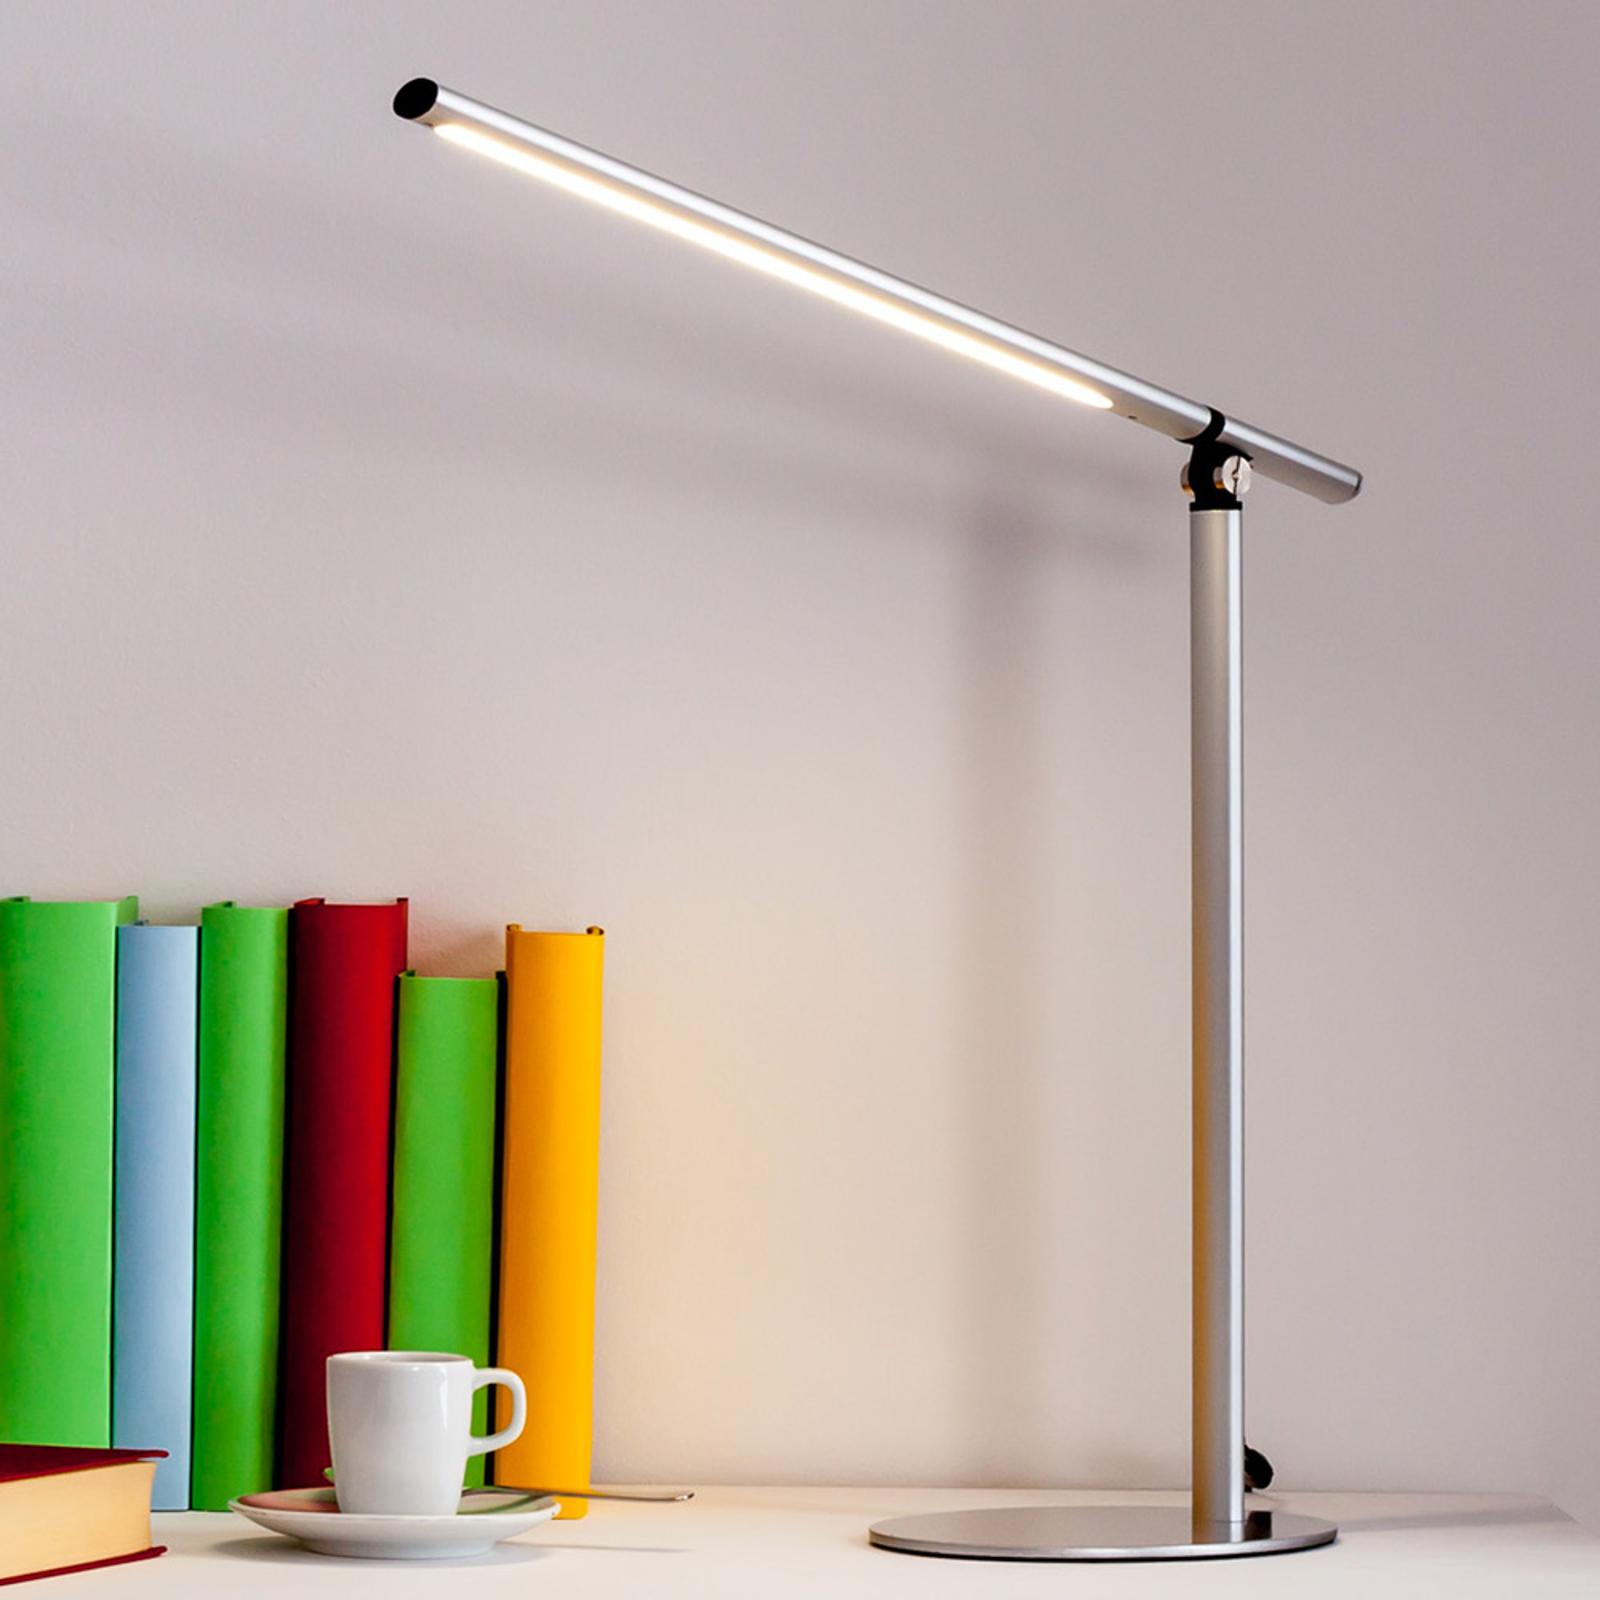 Lampe à poser LED Kolja très moderne gris argenté